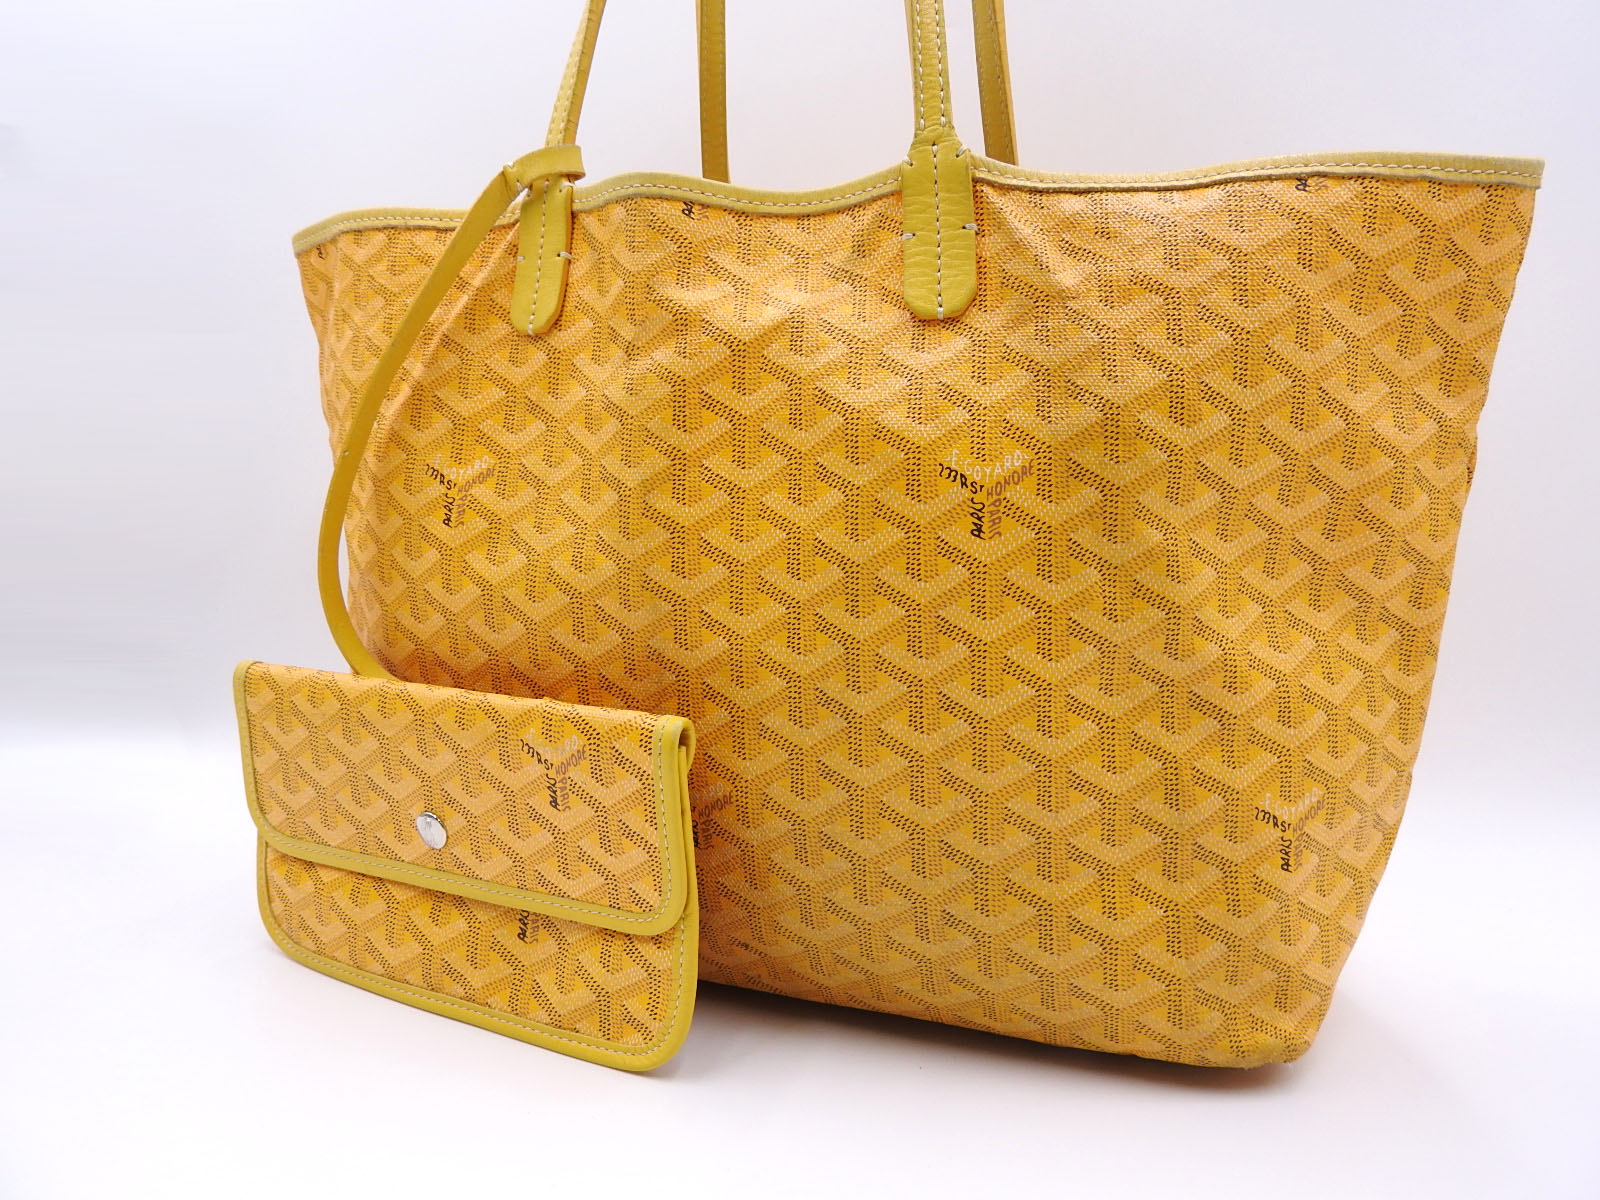 Auth GOYARD Saint Louis PM Shoulder Tote Bag PVC Canvas Leather Yellow With  Pouch A-8941 4f47742b652